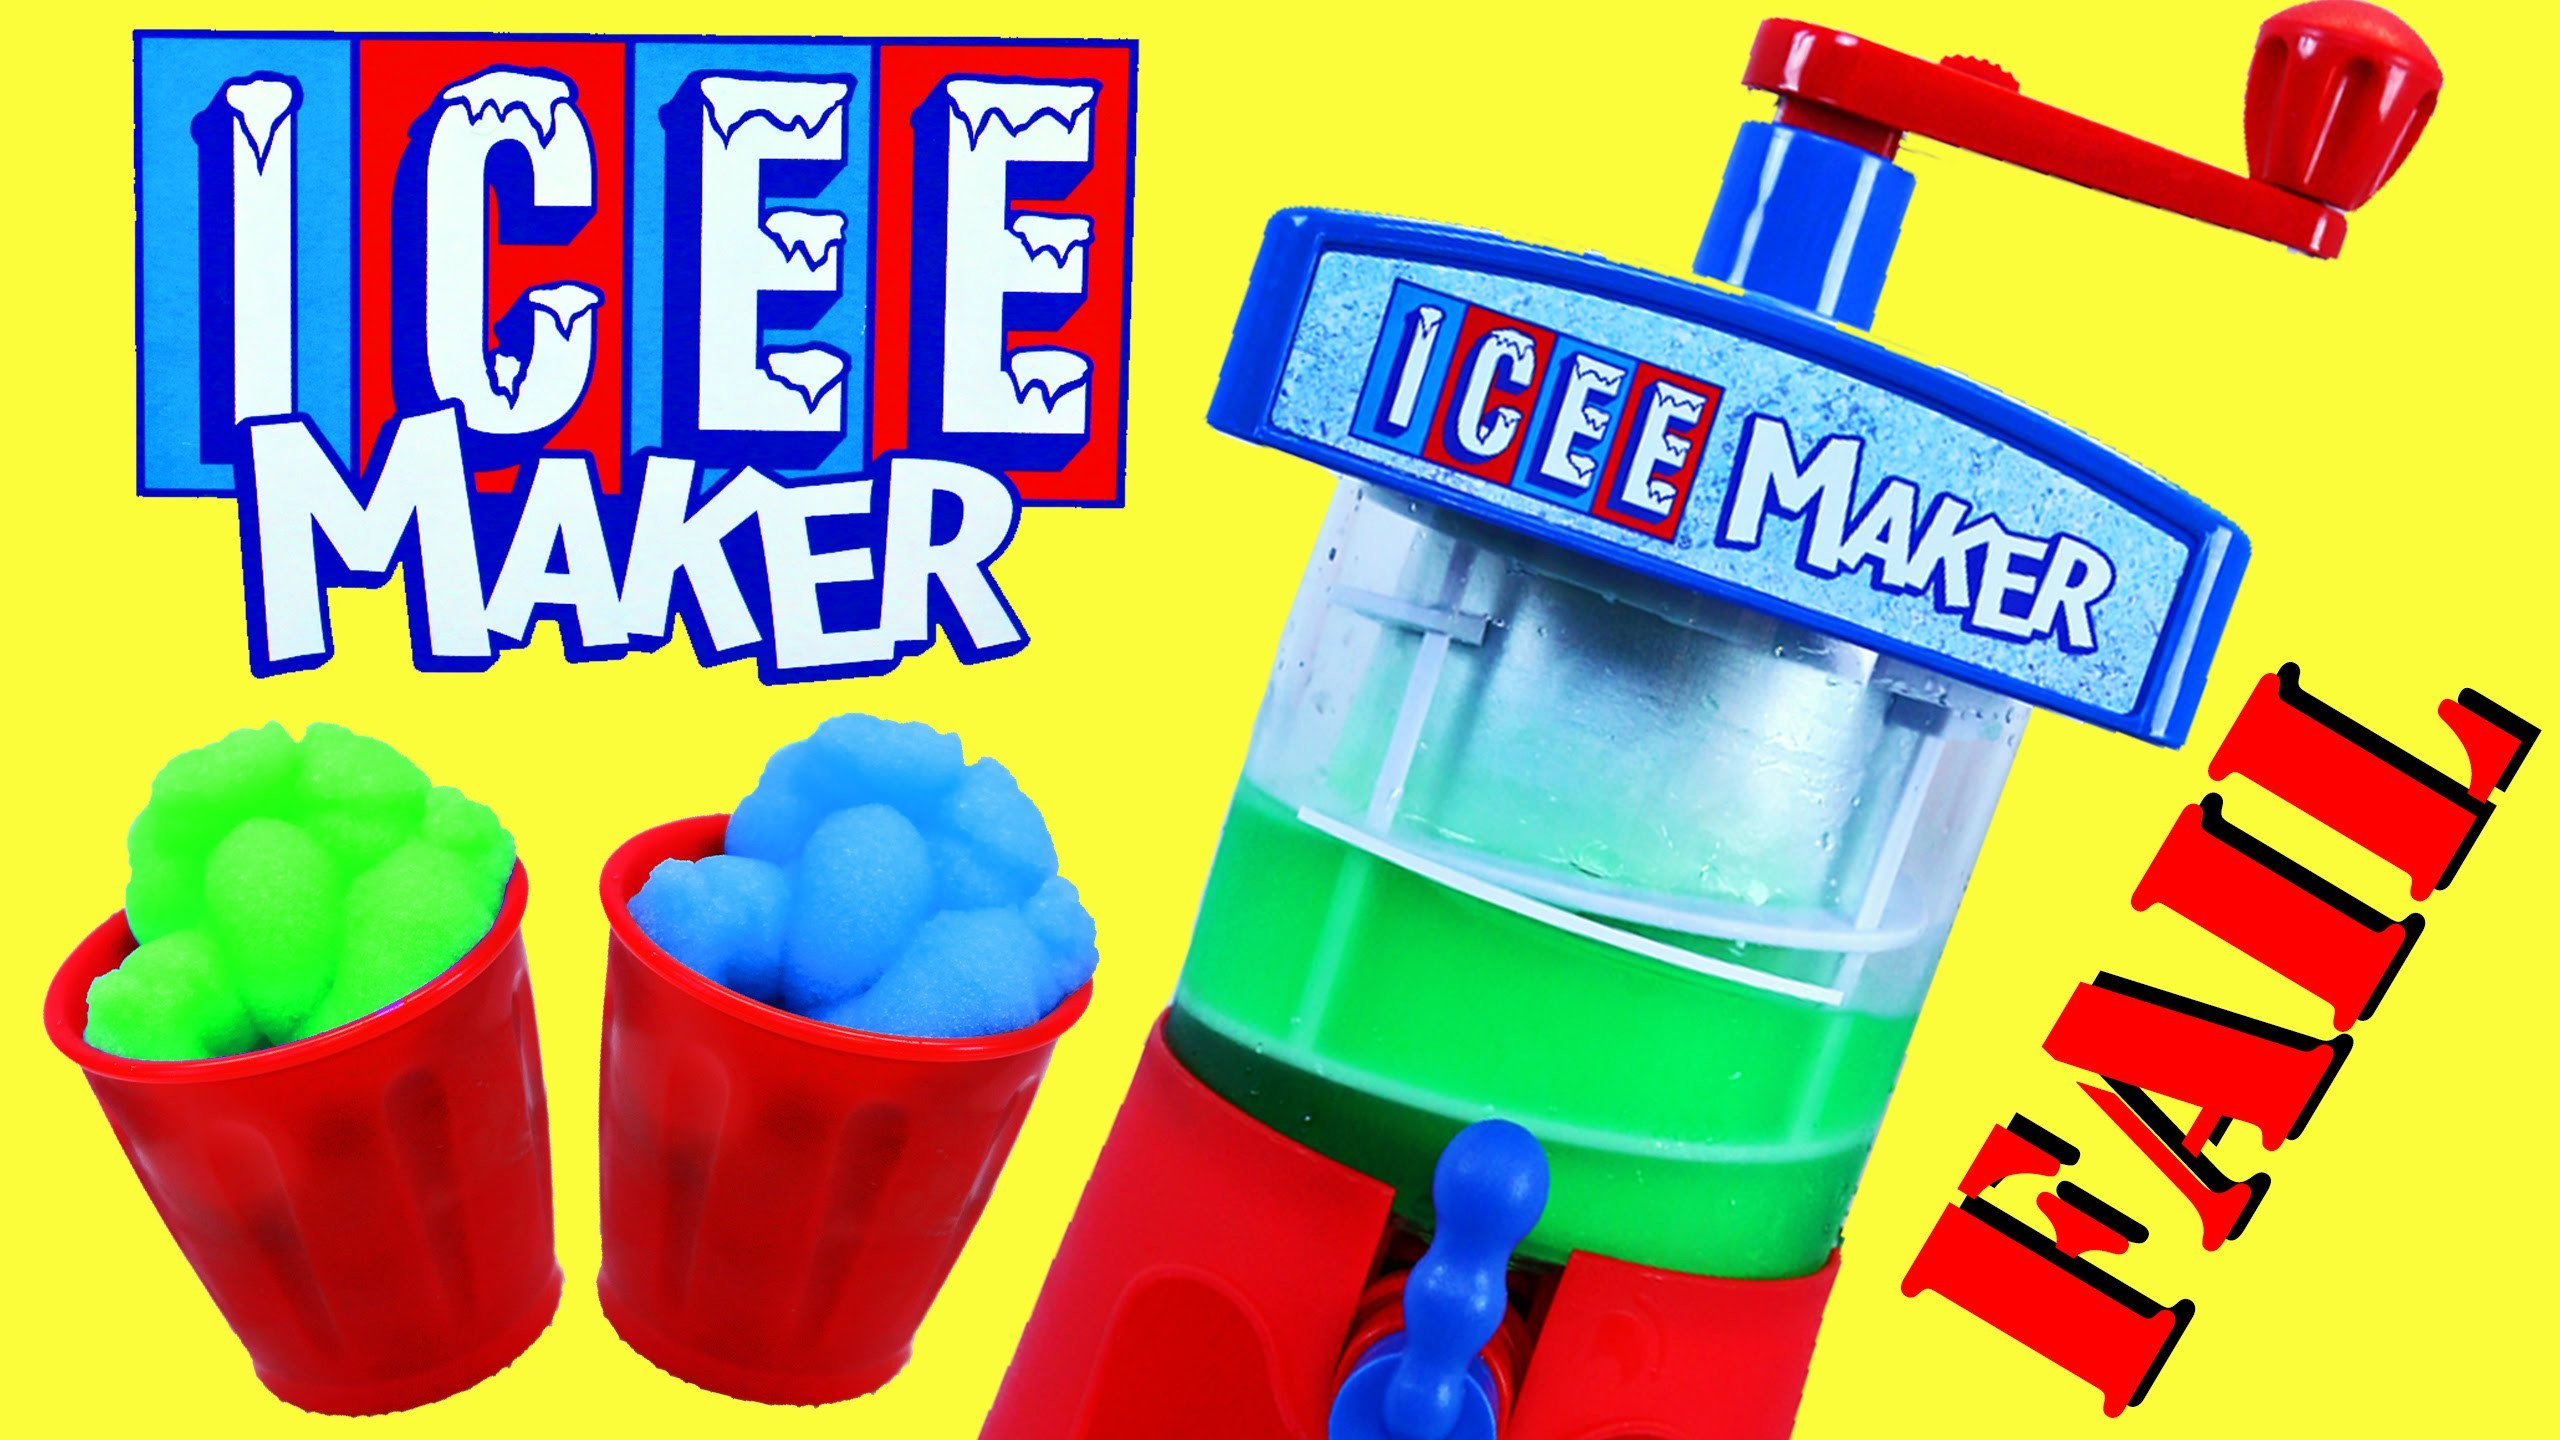 Icee Maker FAIL & Sweet Treats Desserts! DIY Shaved Ice Slushy Toy Ice Cream DisneyCarToys